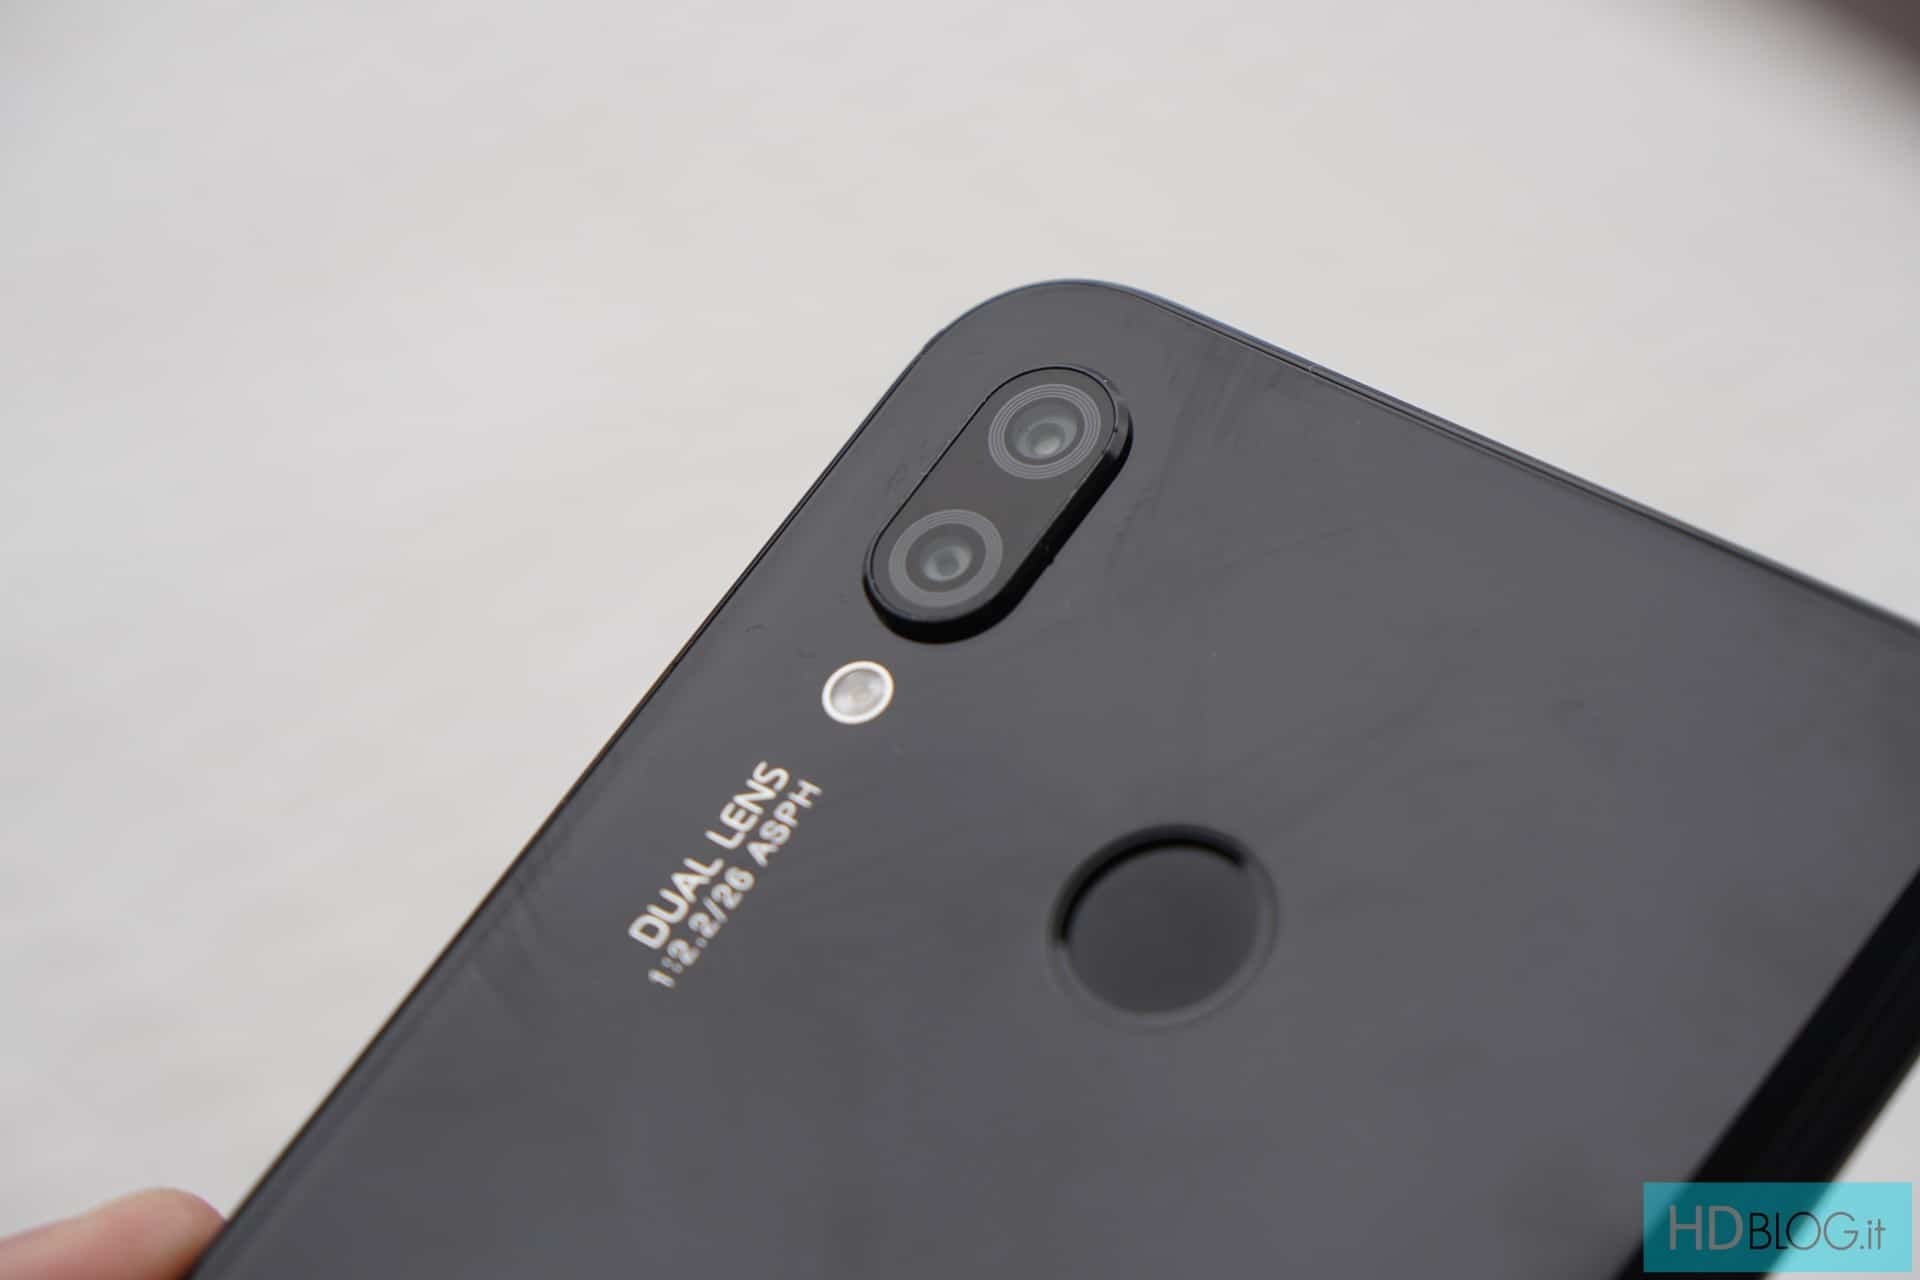 Huawei P20 Lite HDBlog image prelaunch 23